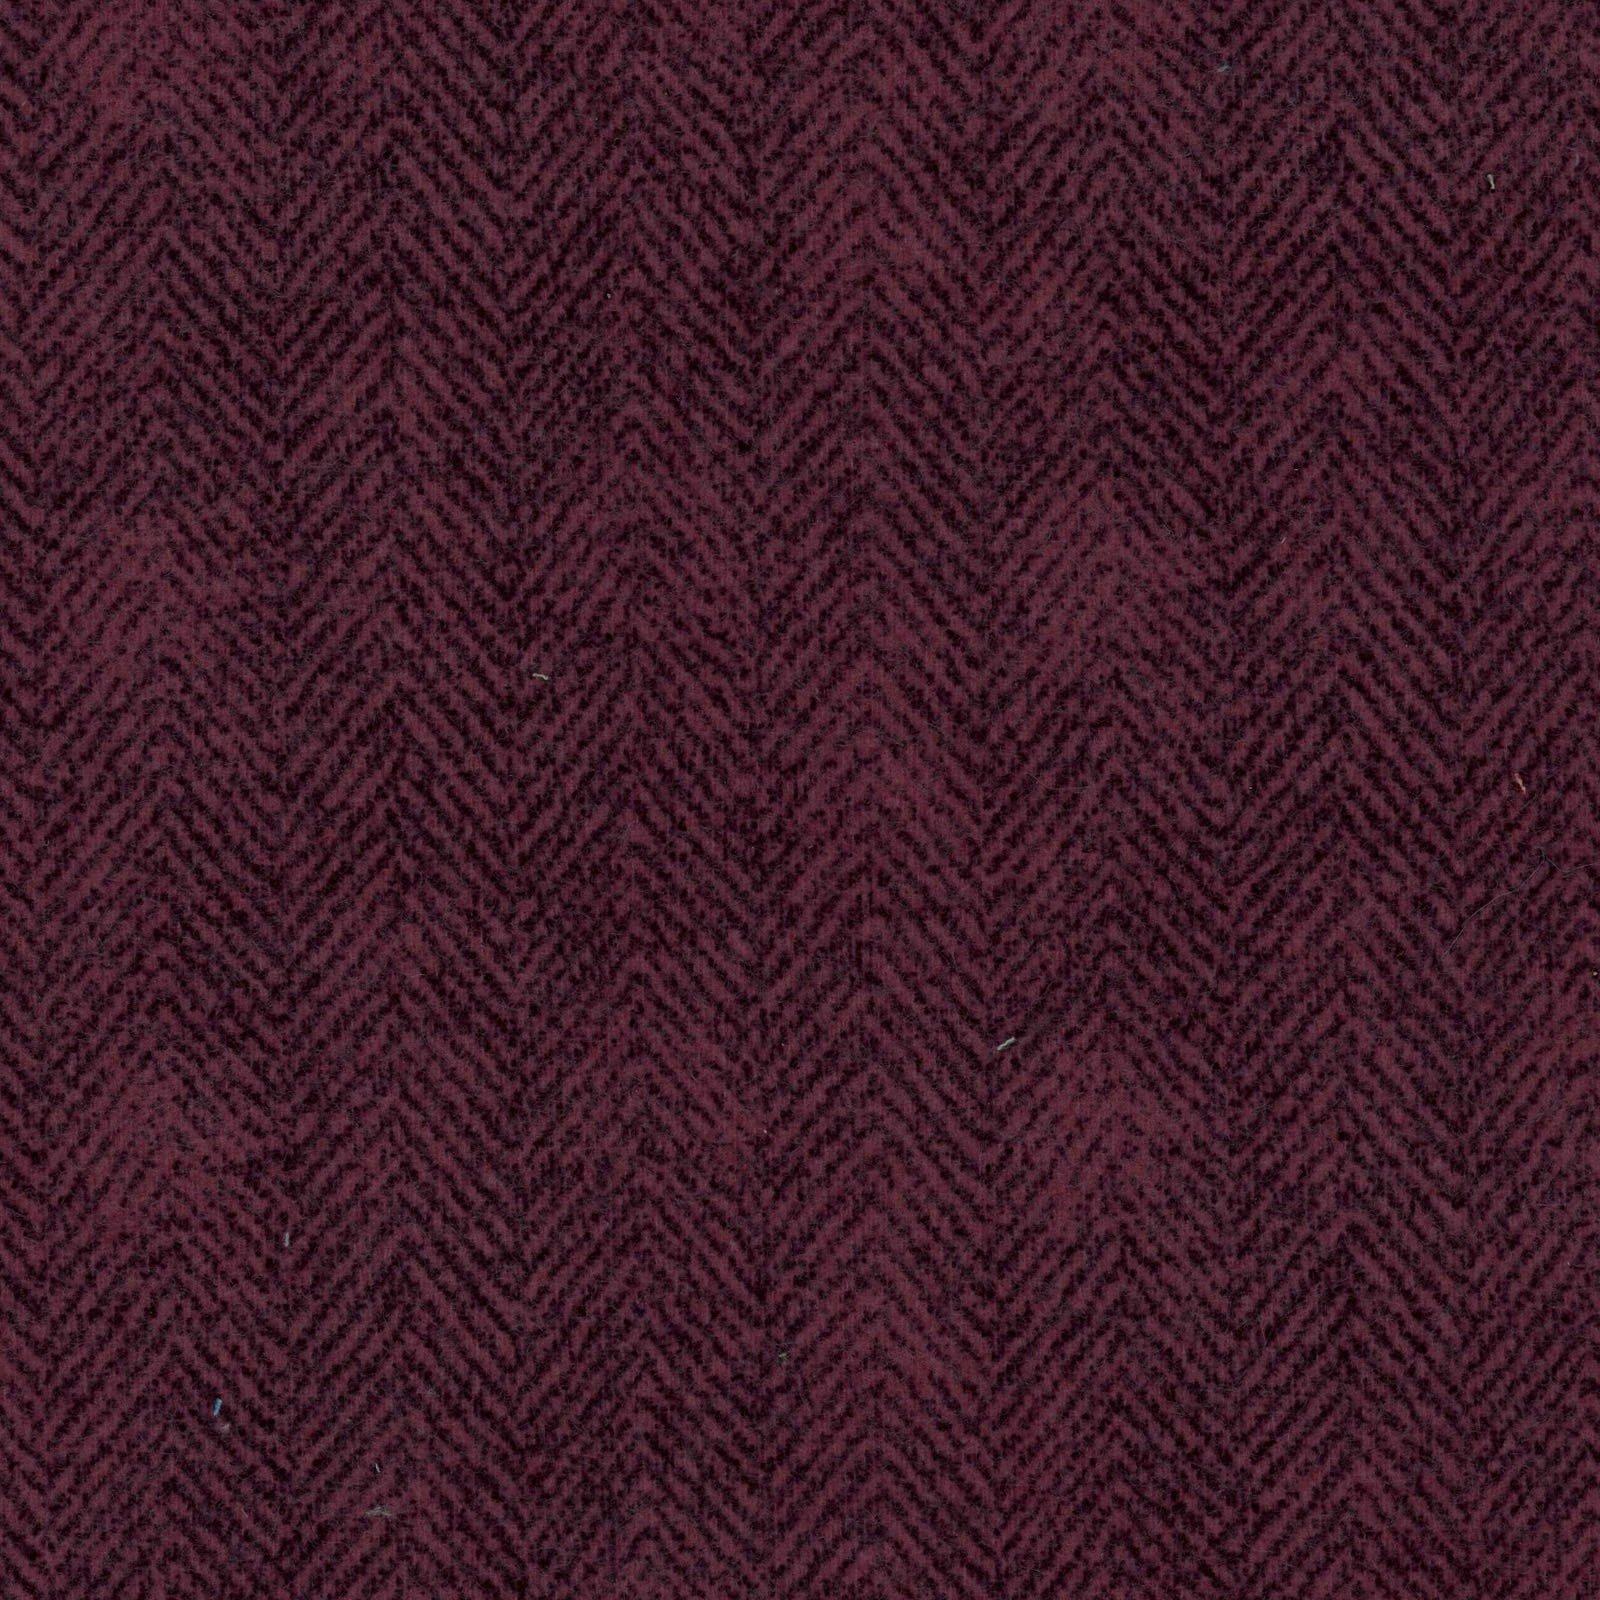 Woolies Flannel Herringbone Orchid Purple (MASF1841-VX)